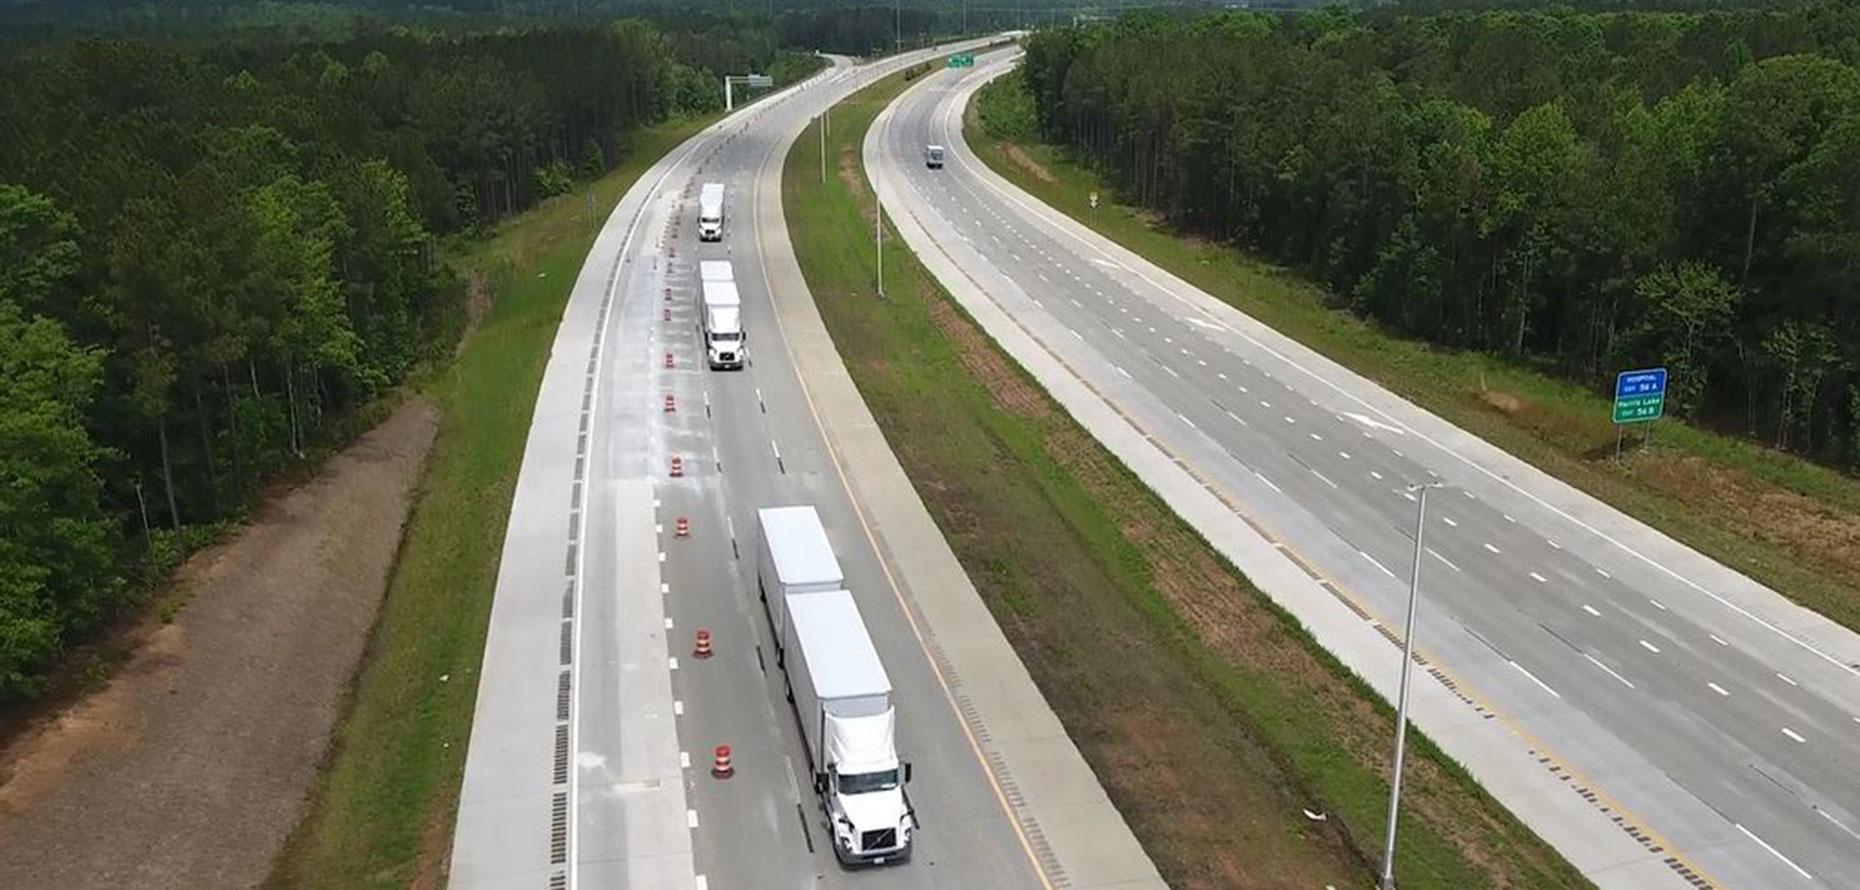 Volvo Trucks Demonstrates Platooning In North Carolina Automotive Testing Technology International